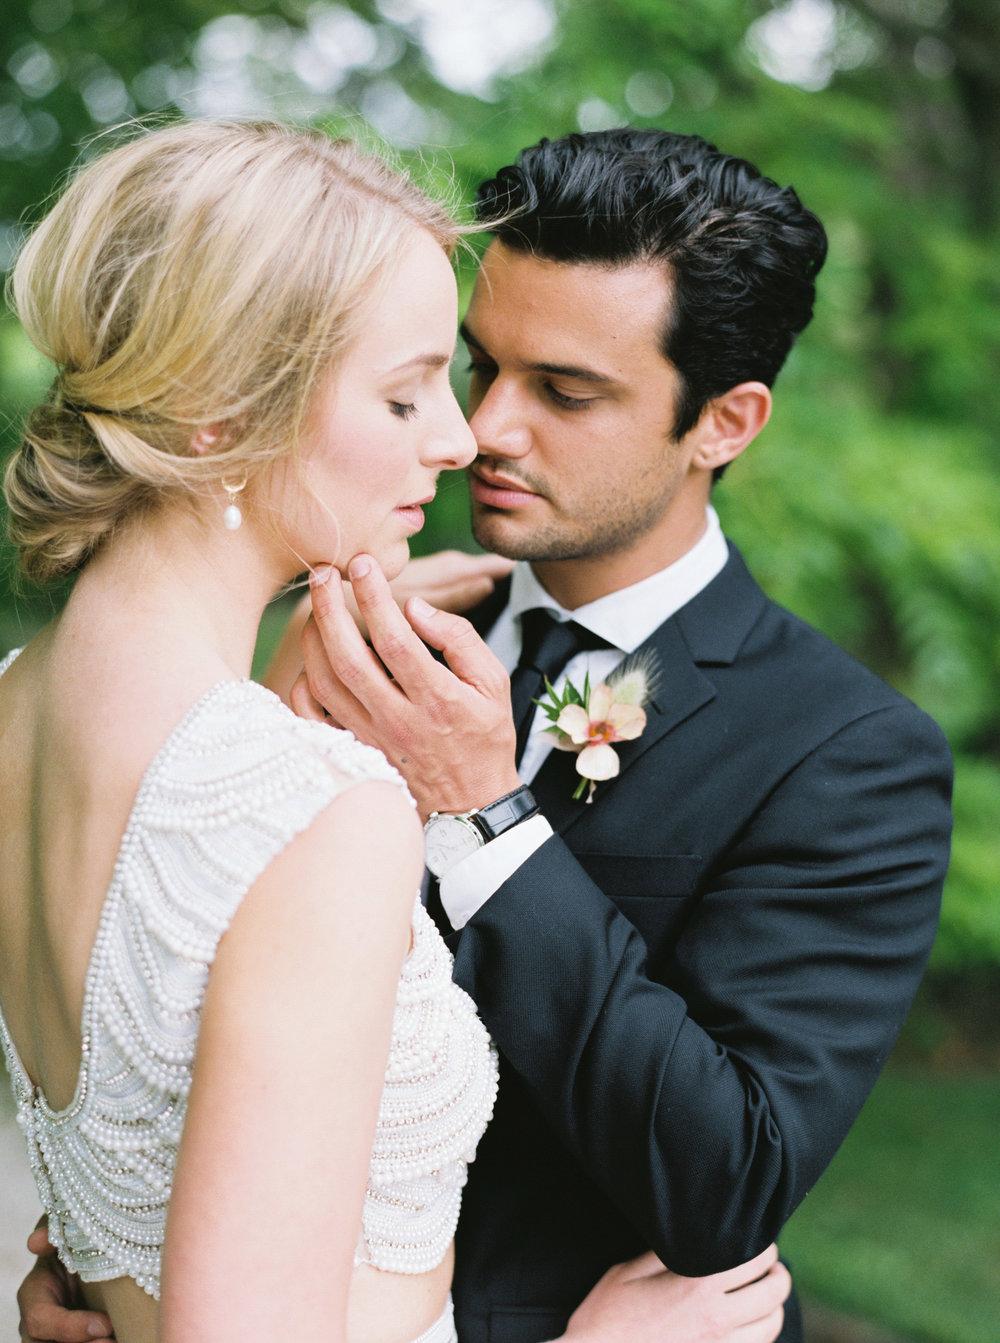 Timeless Southern Highland Wedding Elopement in Bowral NSW Fine Art Film Photographer Sheri McMahon-31.jpg